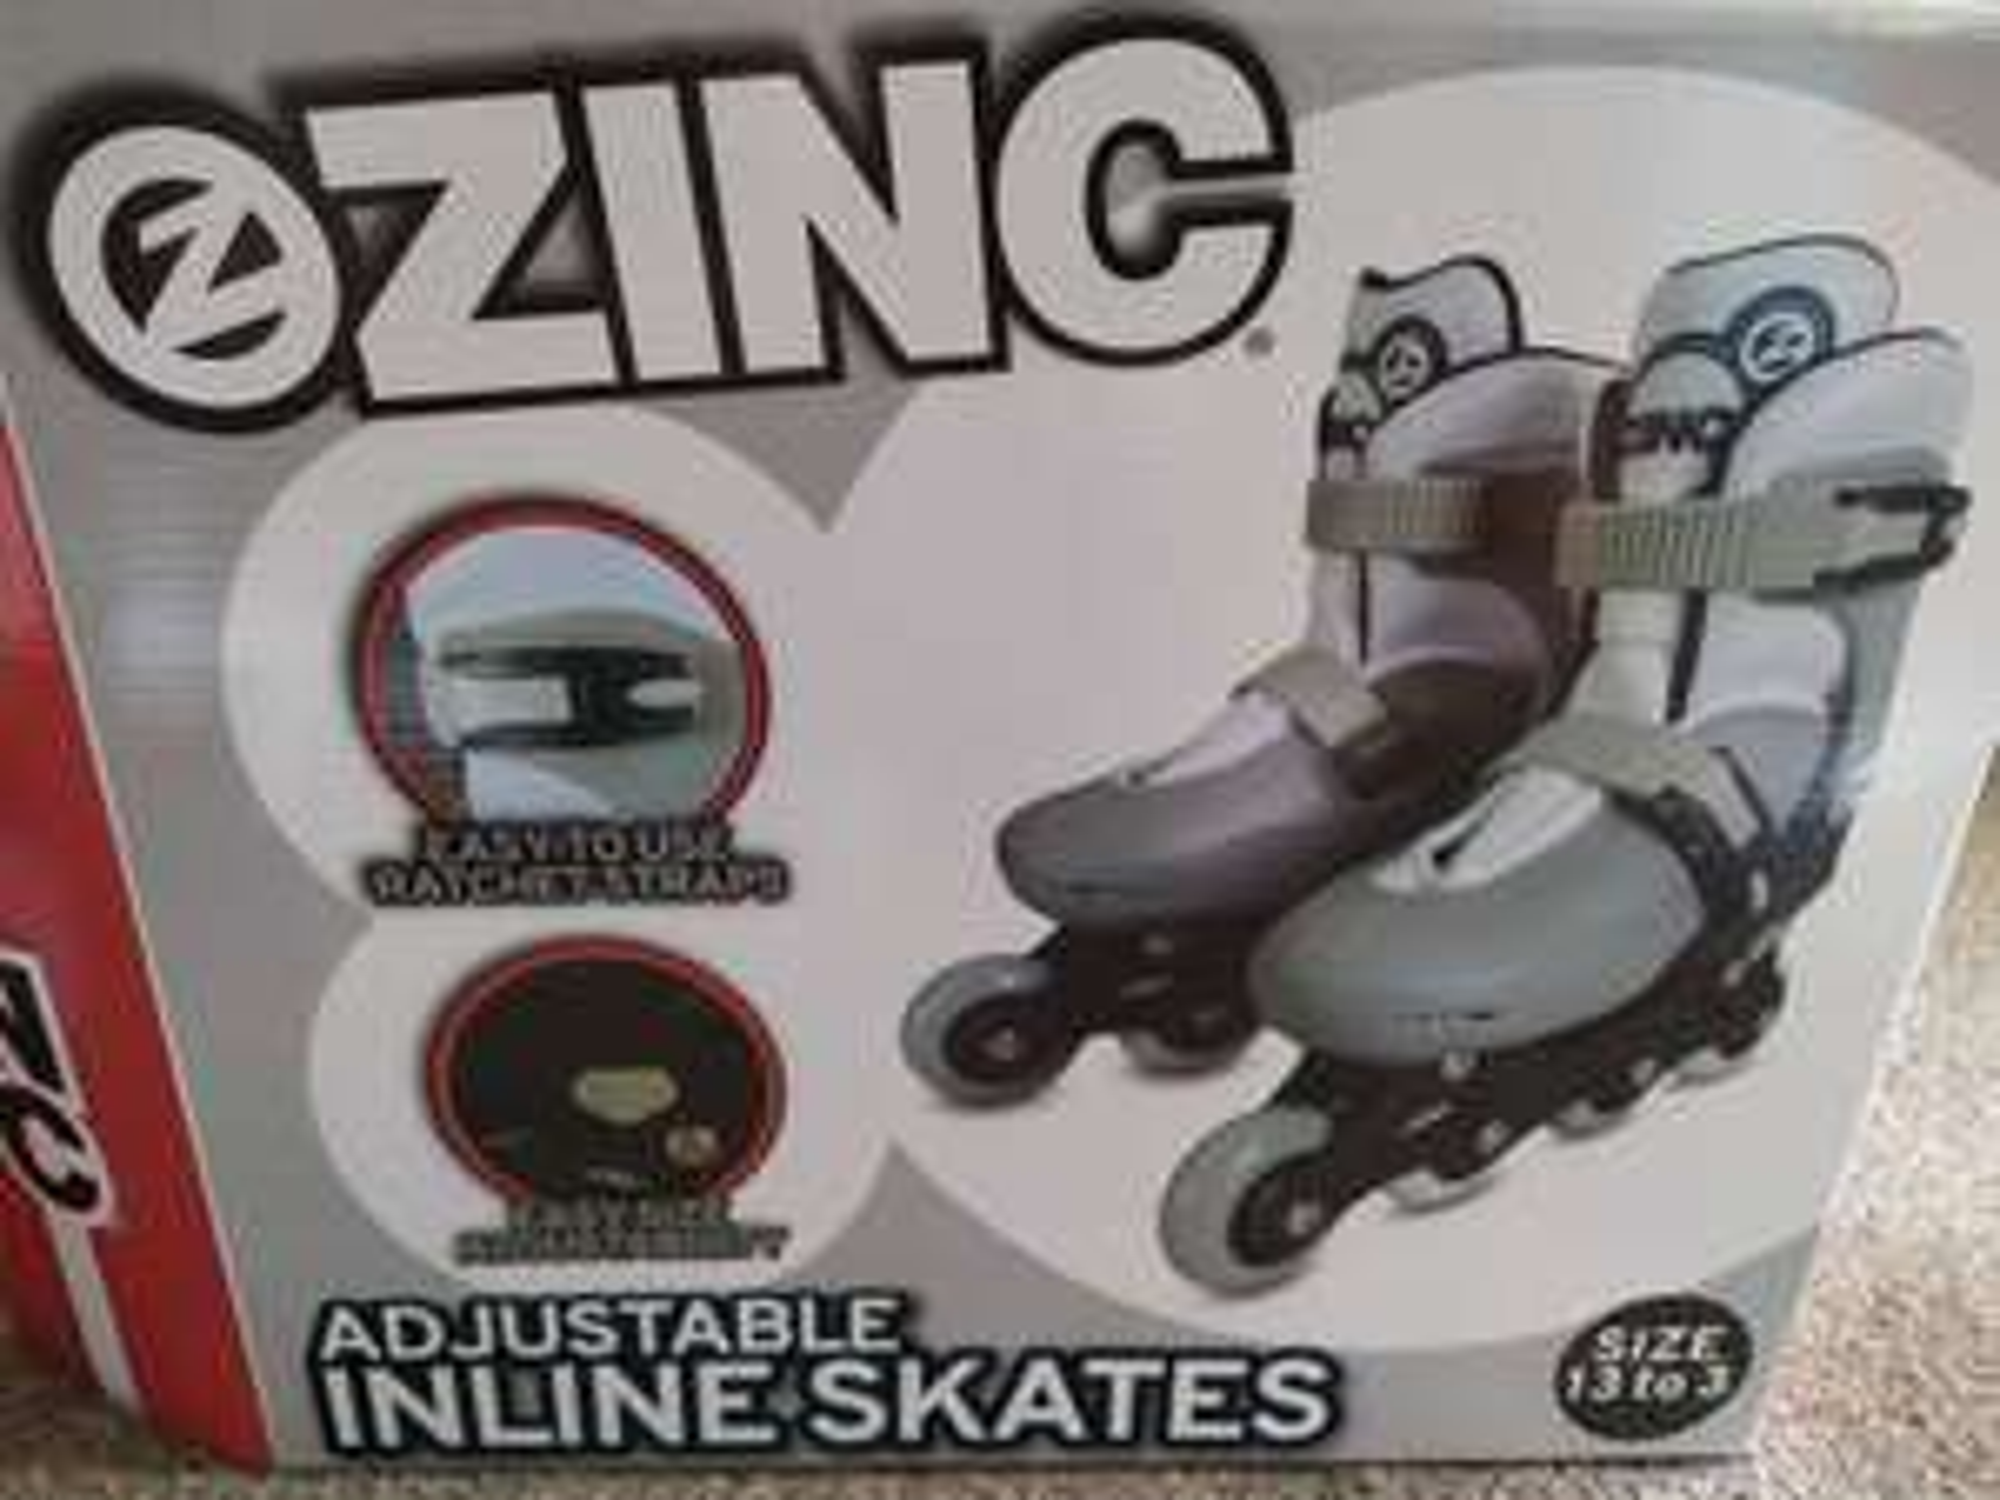 Zinc Adjustable Inline Skates (Size c13-3) £3.99 instore Clearance Bargains in Stanley, Durham